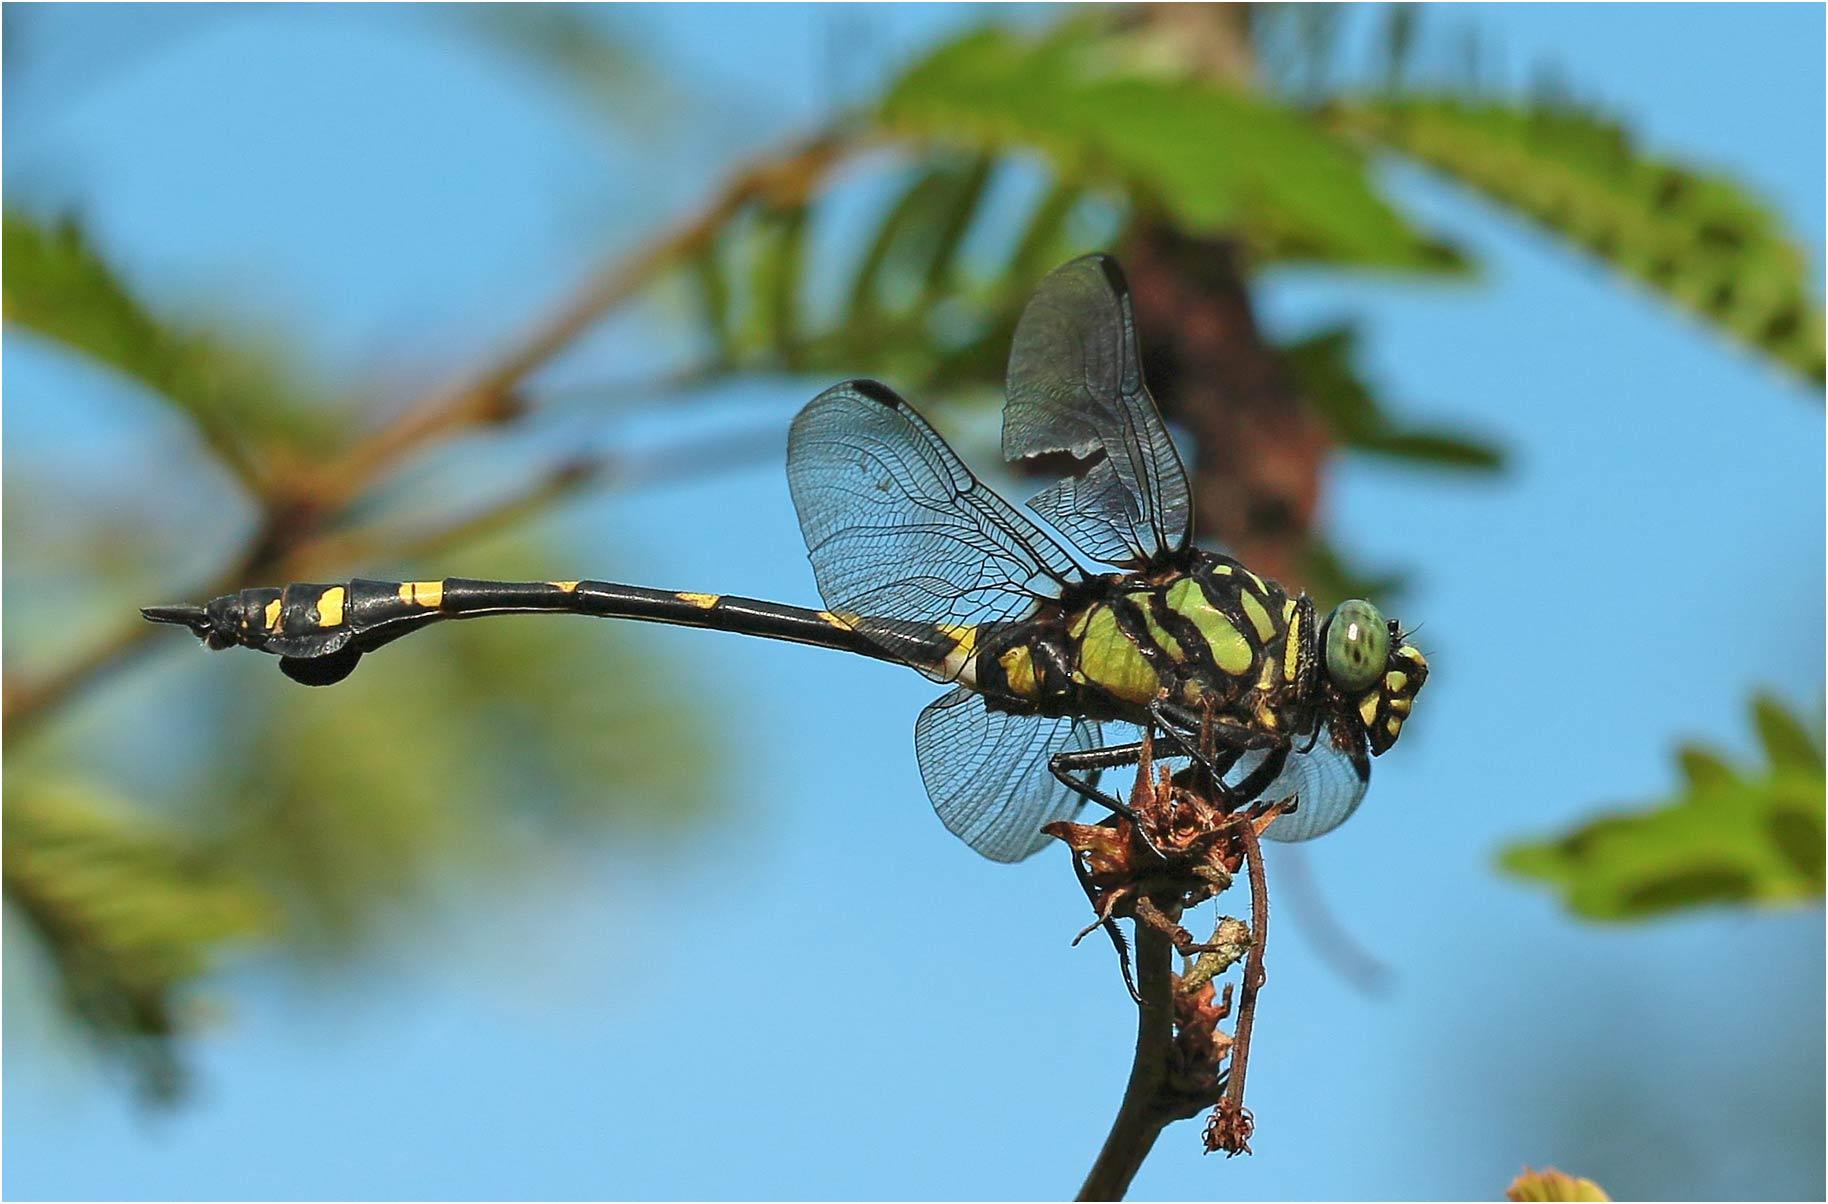 Ictinogomphus pertinax mâle, Vietnam, Cuc Phuong, 14/06/2018